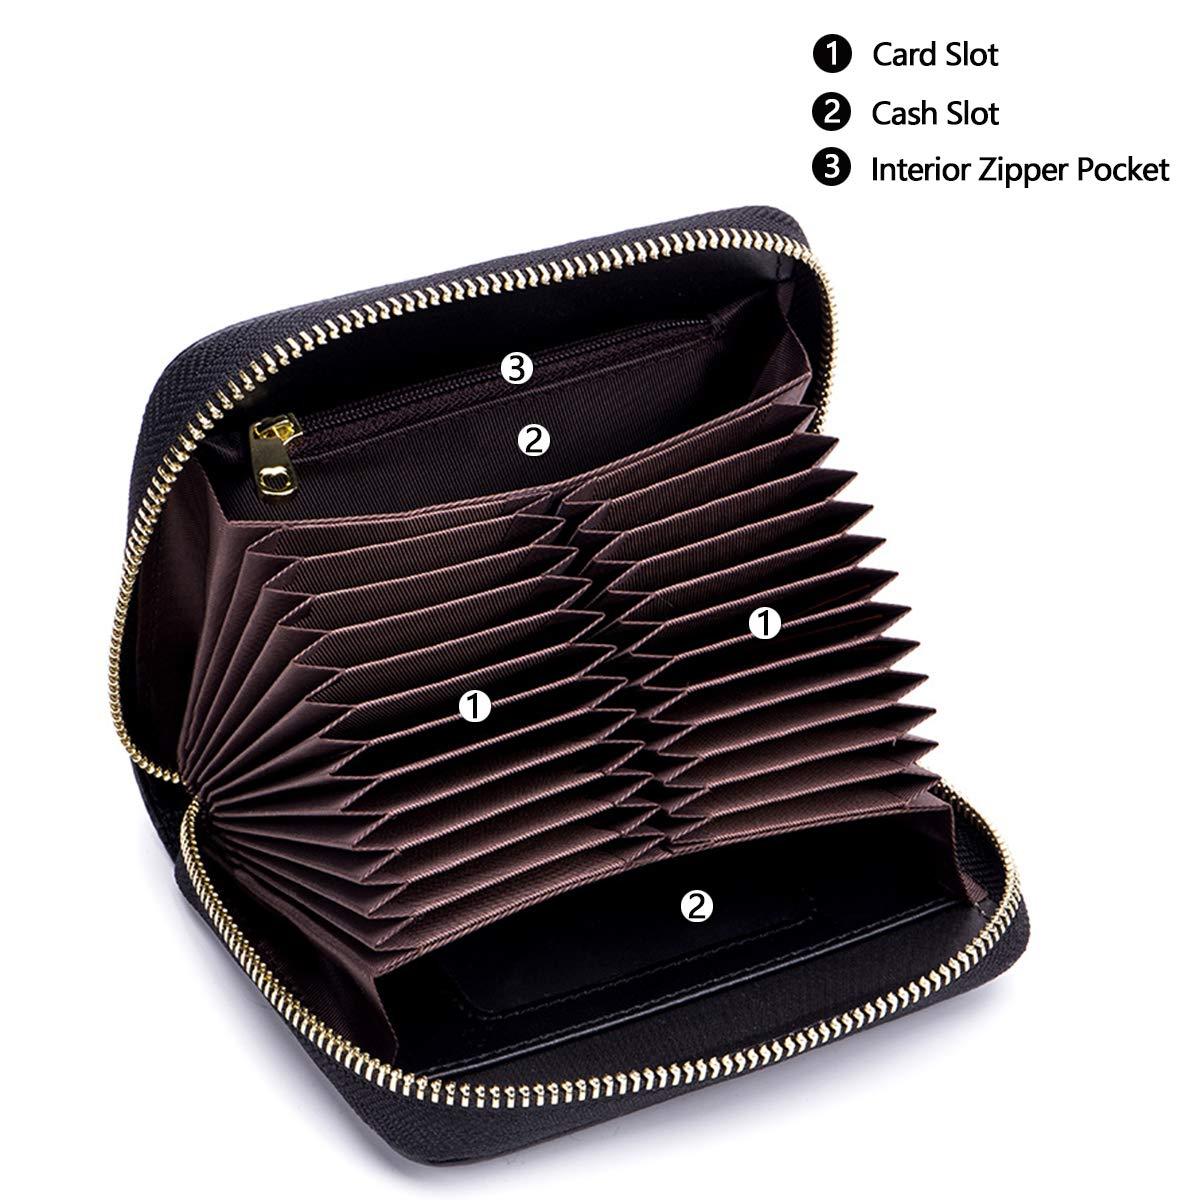 imeetu Women/men RFID Blocking Leather Credit Card Holder case Accordion Wallet 24 Slots Purses with Zipper Pocket(Wine Red) by imeetu (Image #4)